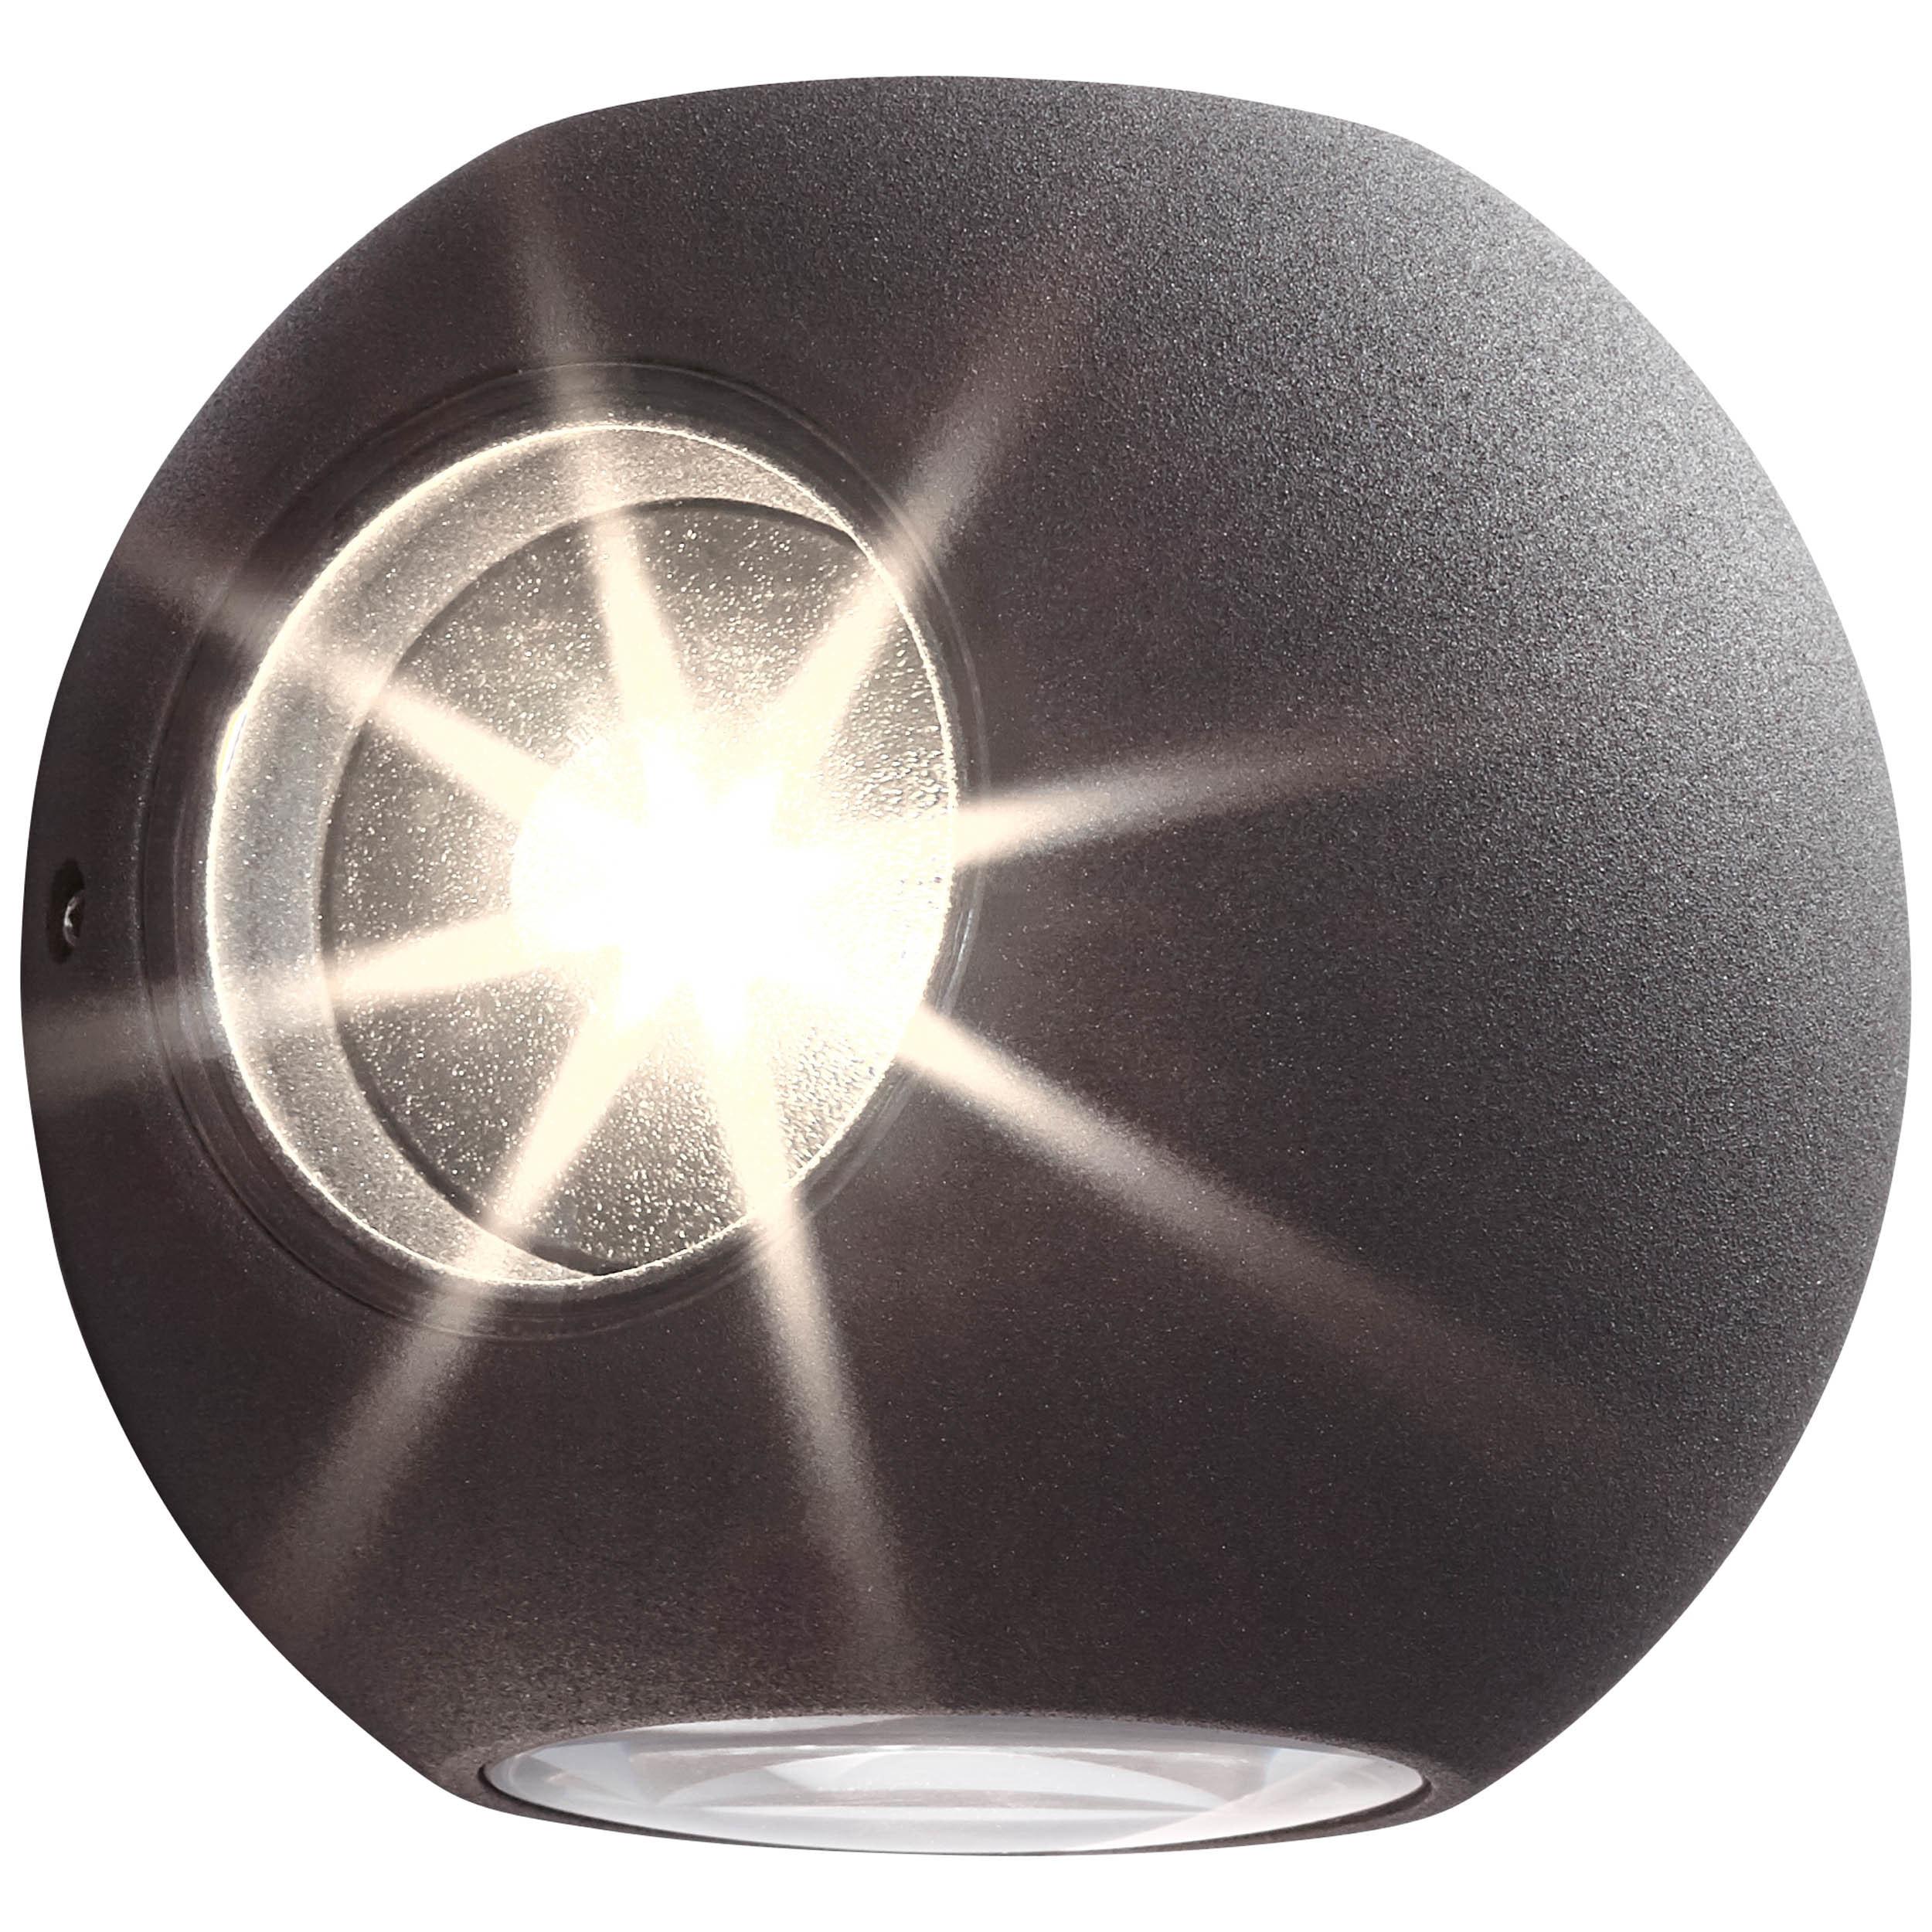 AEG Gus LED Außenwandleuchte 4flg anthrazit